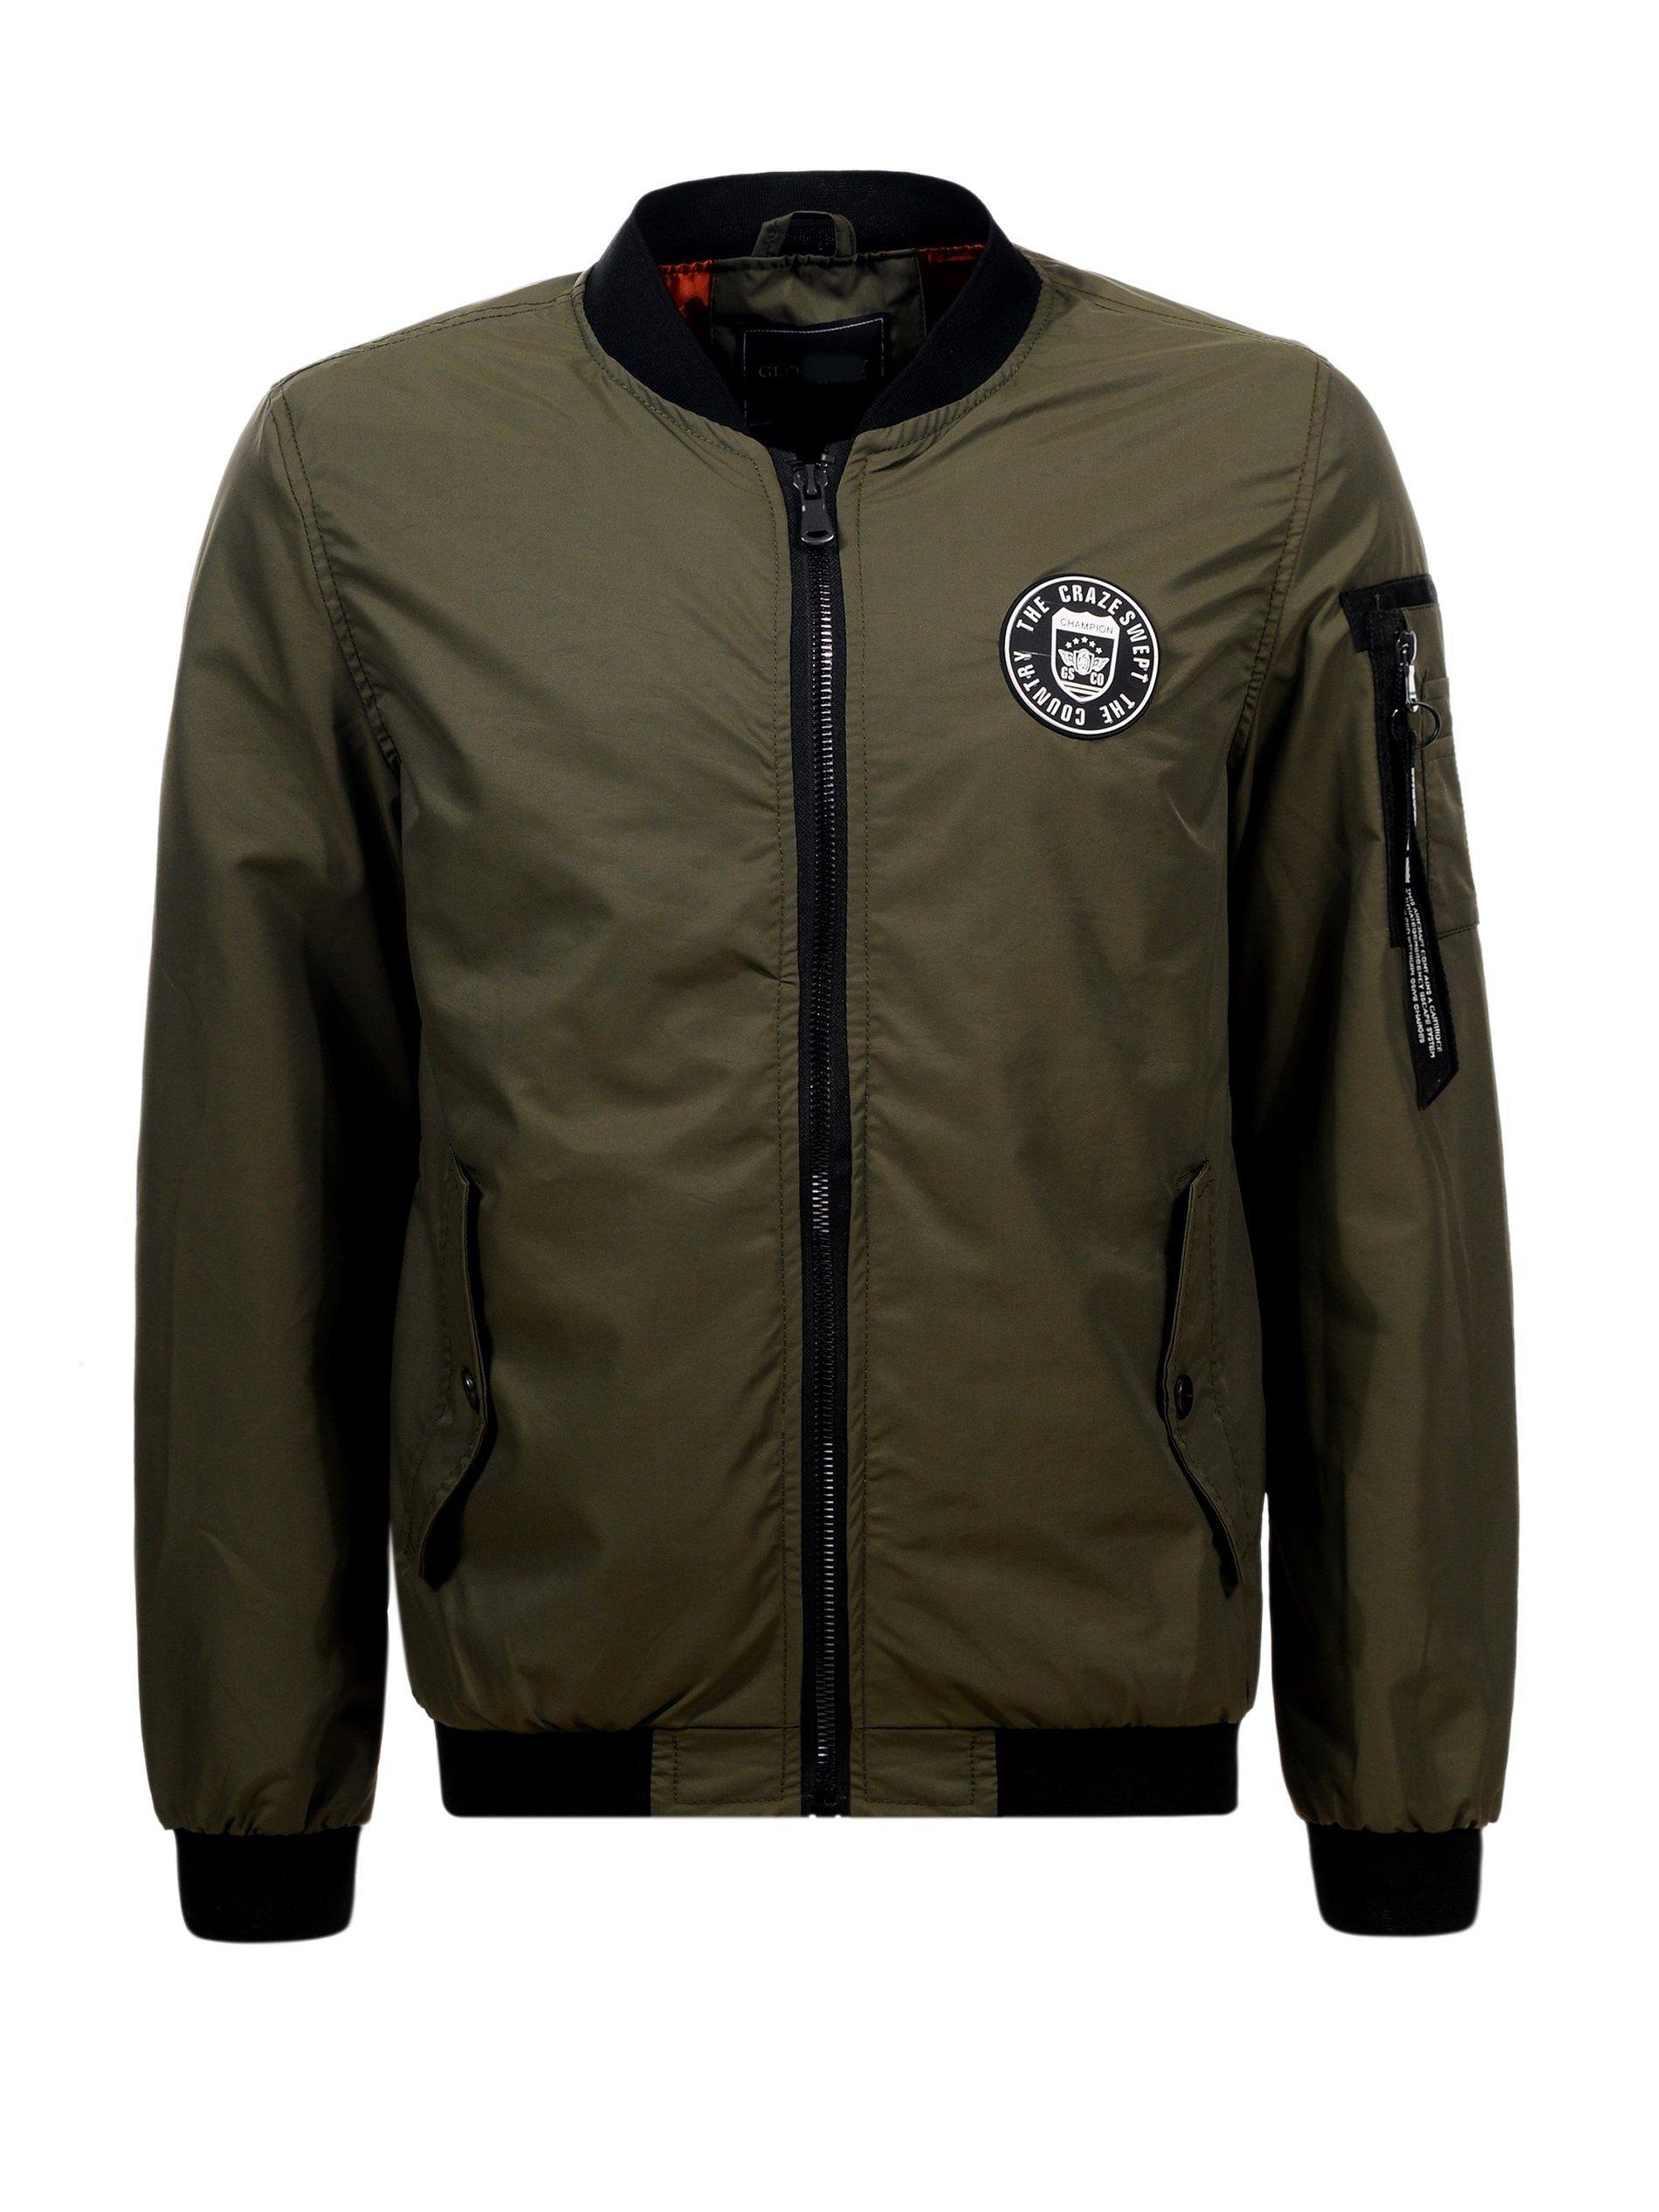 Meska Kurtka Bomberka Wiosenna Zielona Khaki L 7231033844 Oficjalne Archiwum Allegro Fashion Jackets Motorcycle Jacket